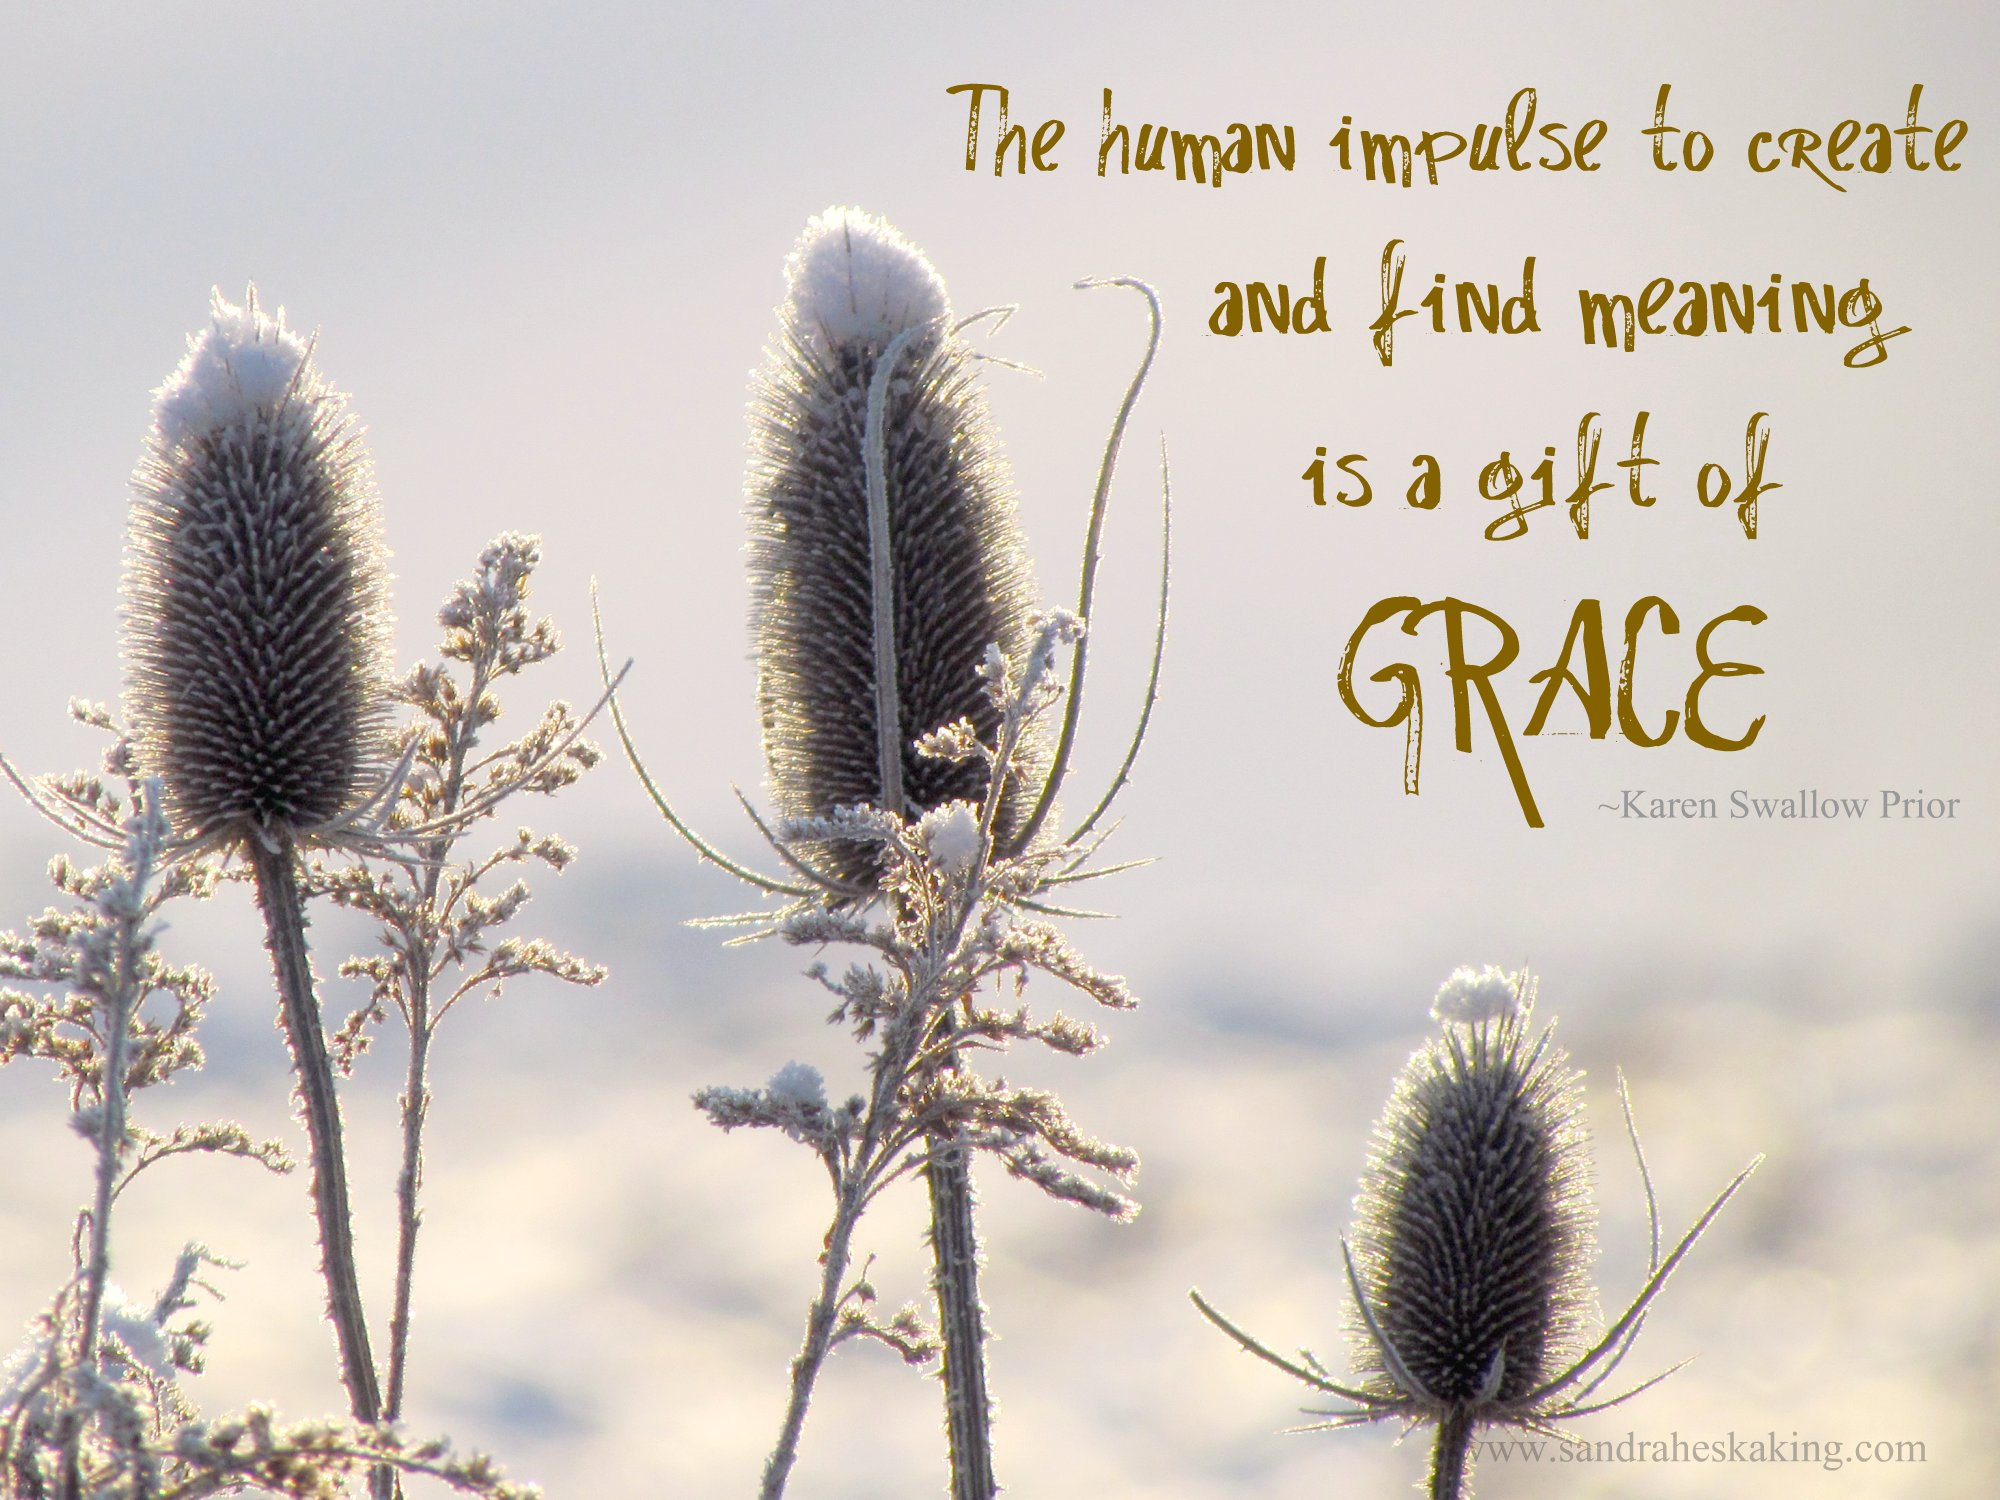 Grace quote #2